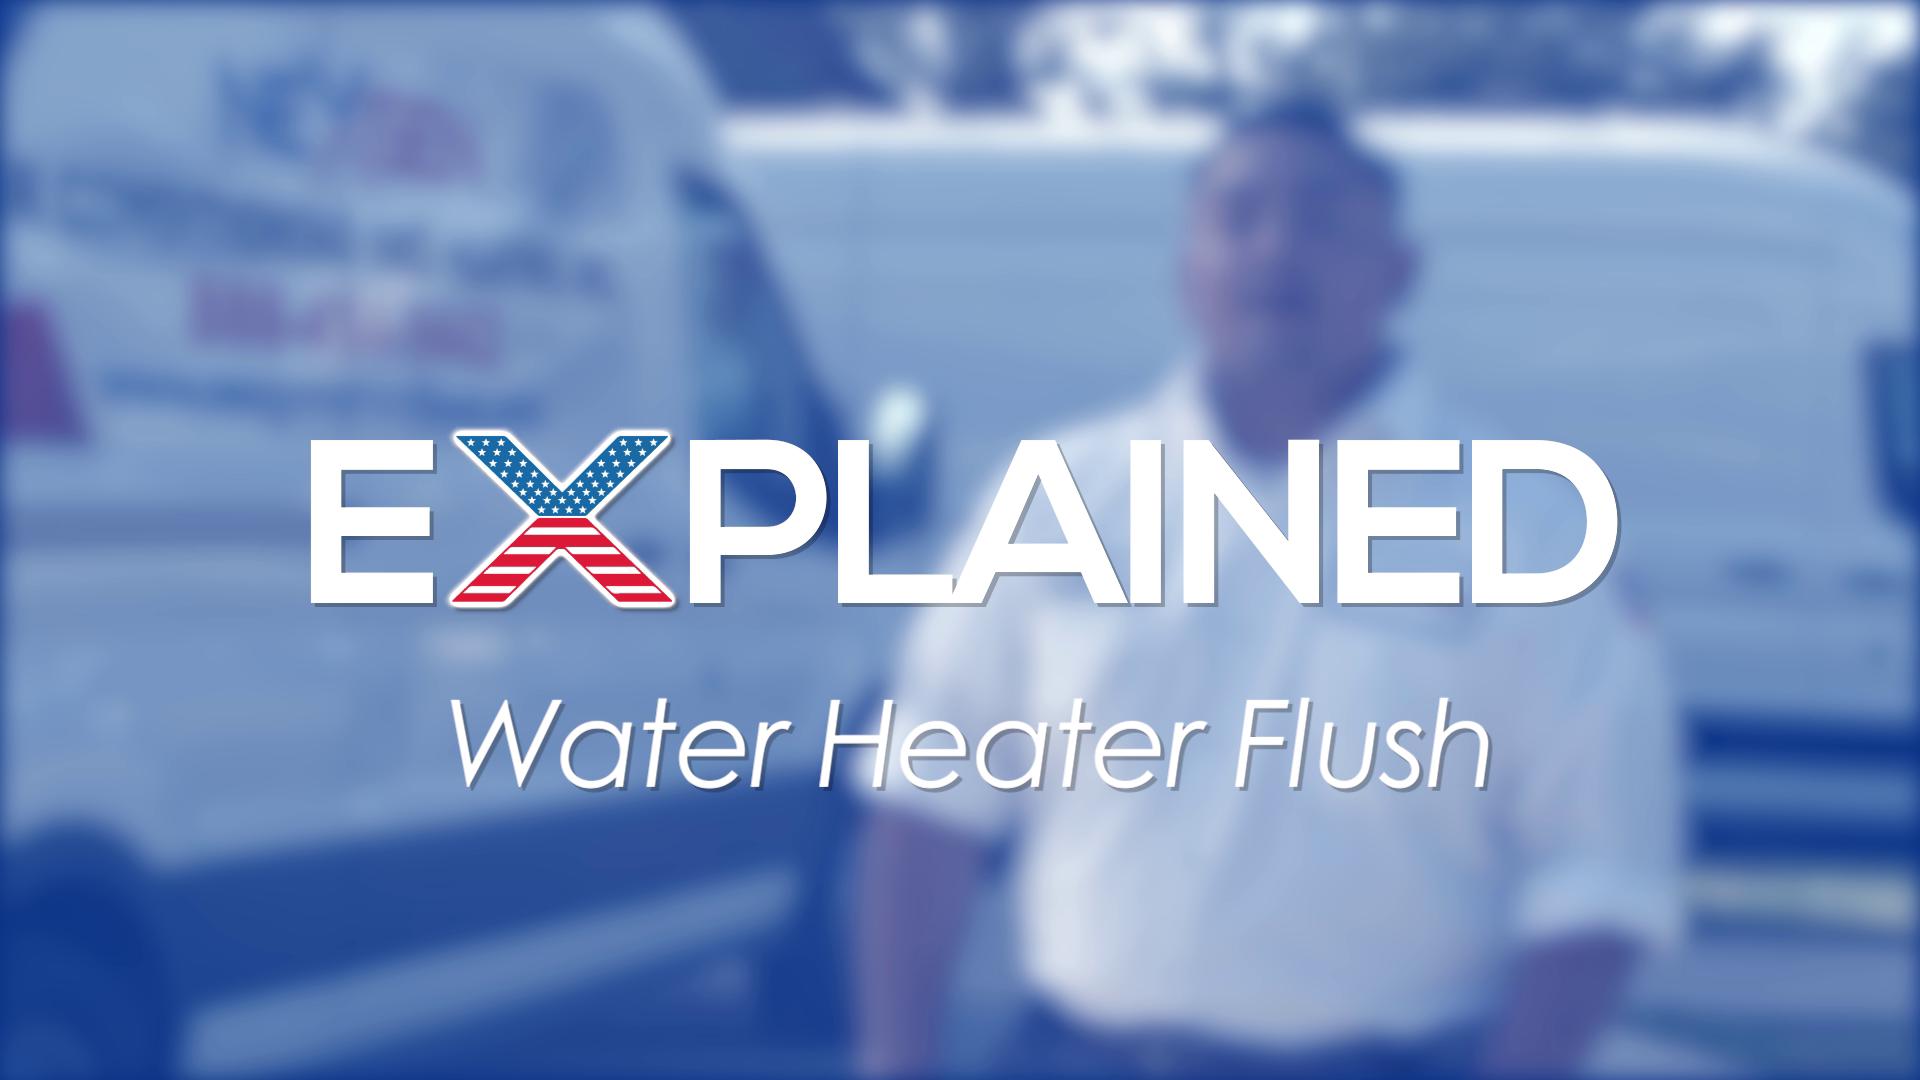 Water Heater Flush Xplained